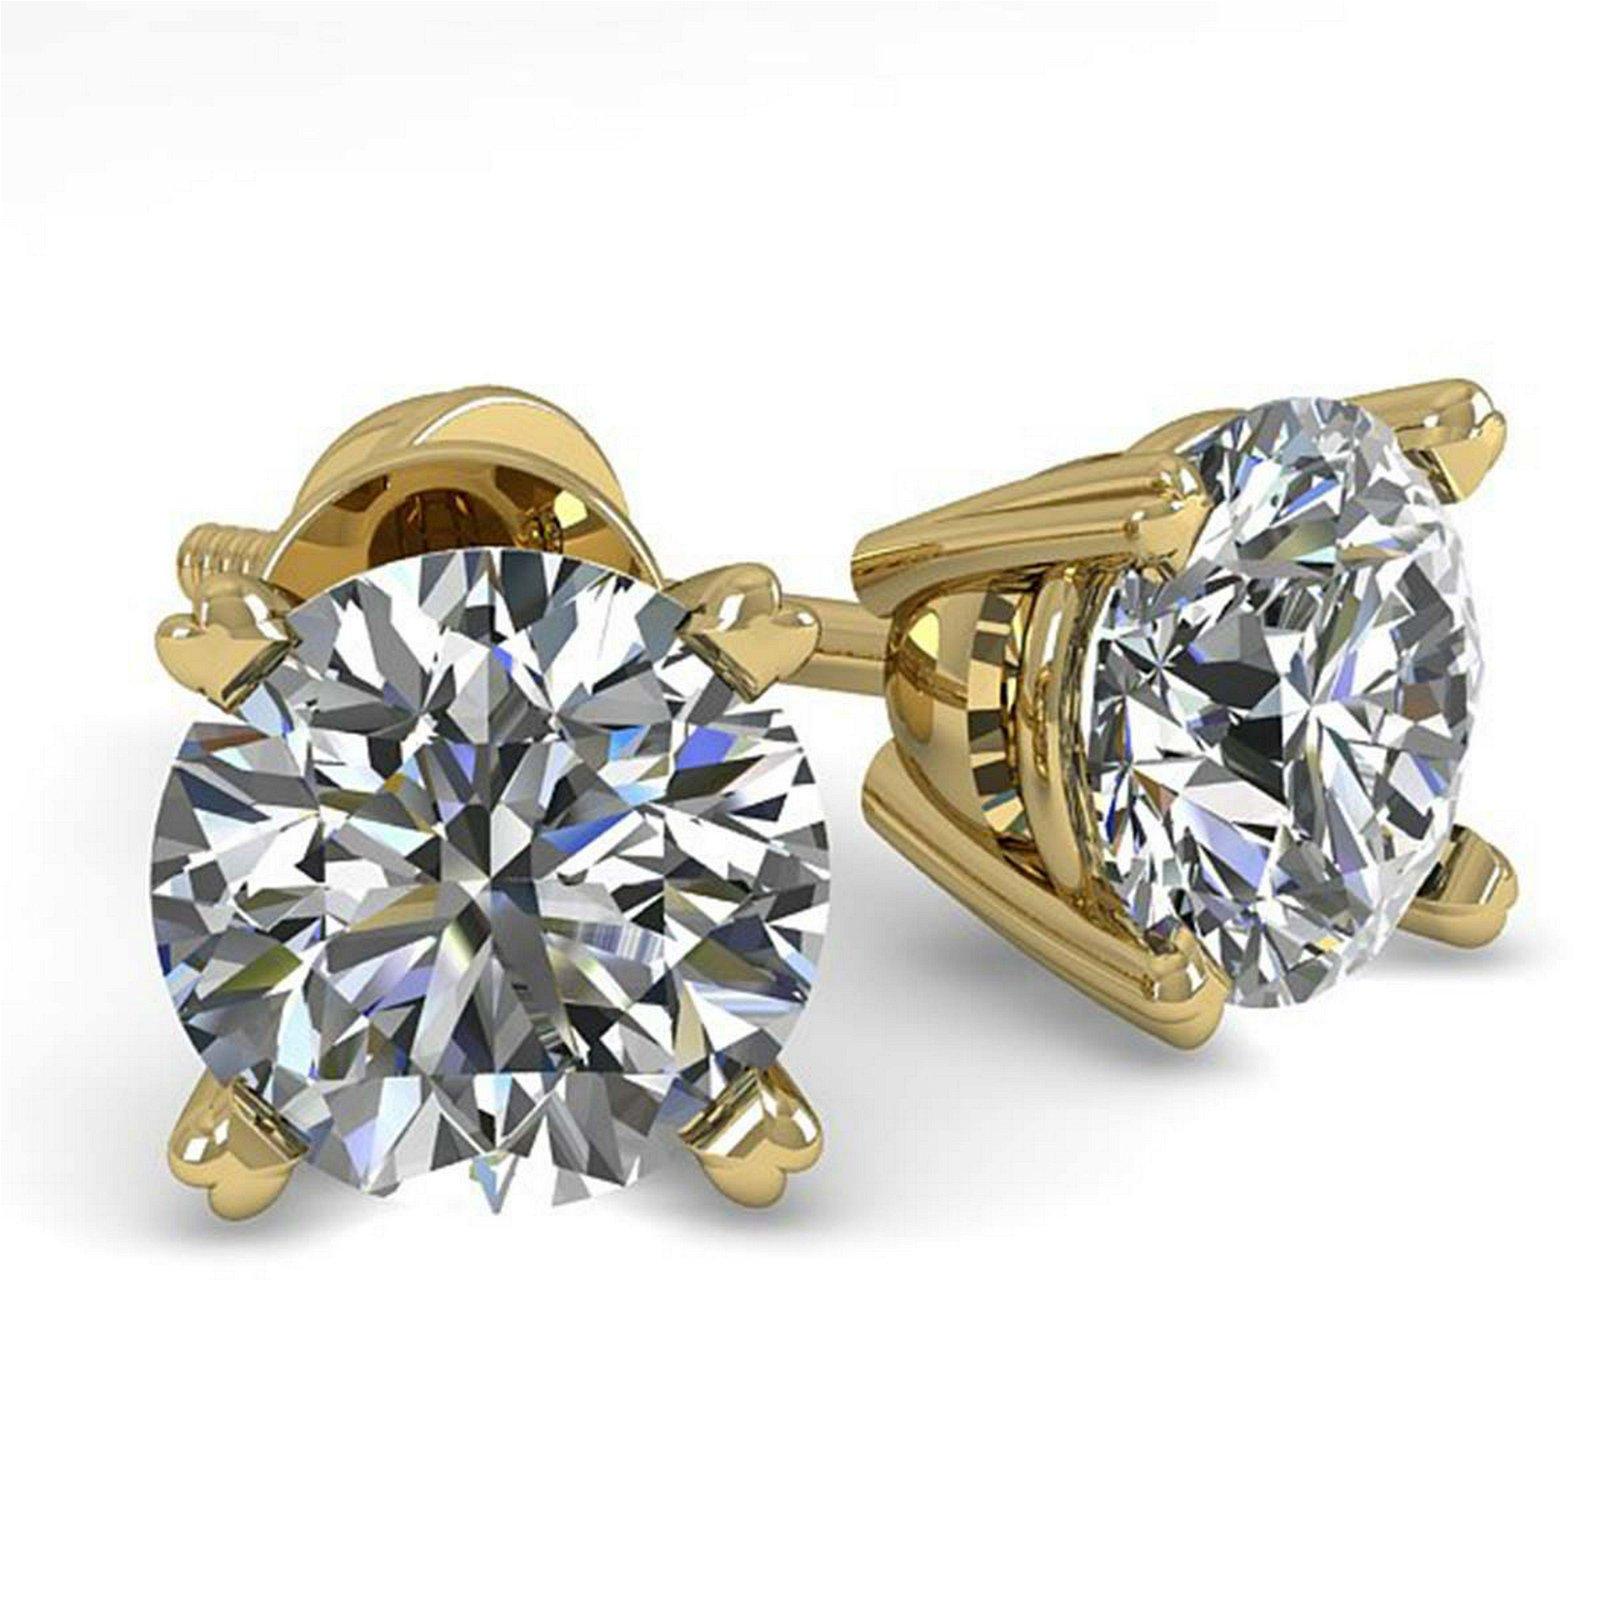 1.0 ctw VS/SI Diamond Stud Earrings 14K Yellow Gold -